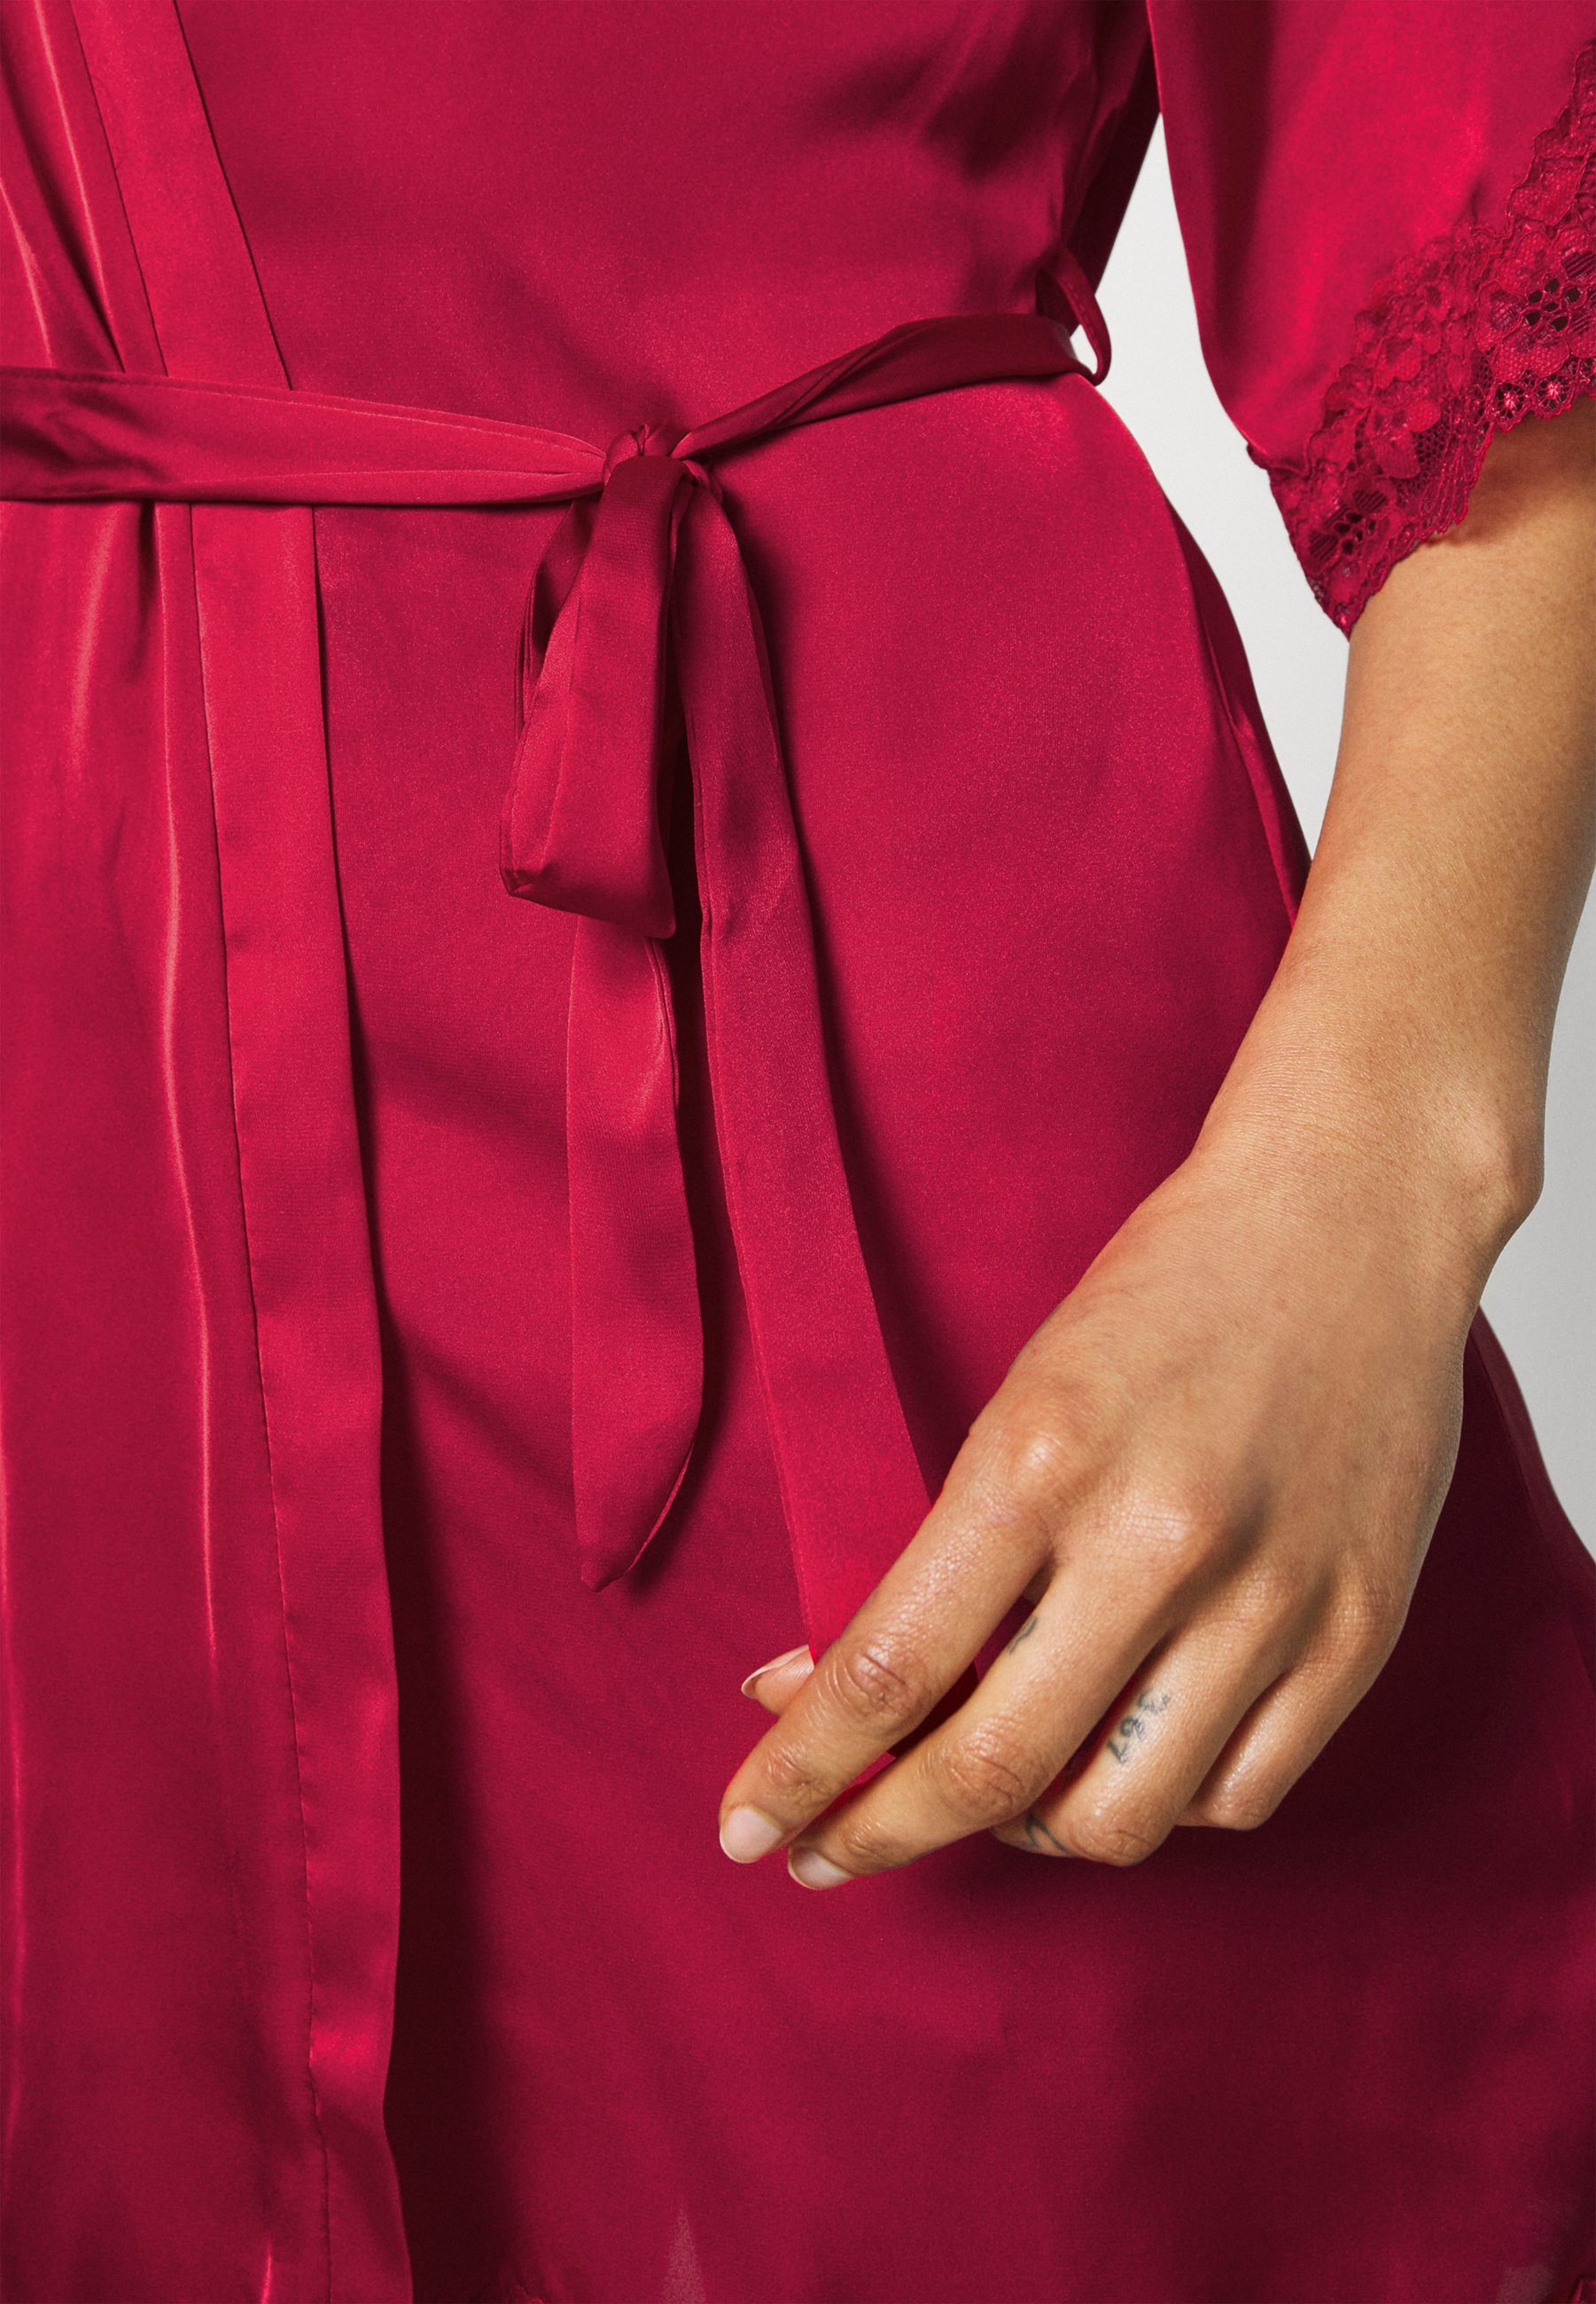 Damen Ariana dressing gown gift set - Bademantel